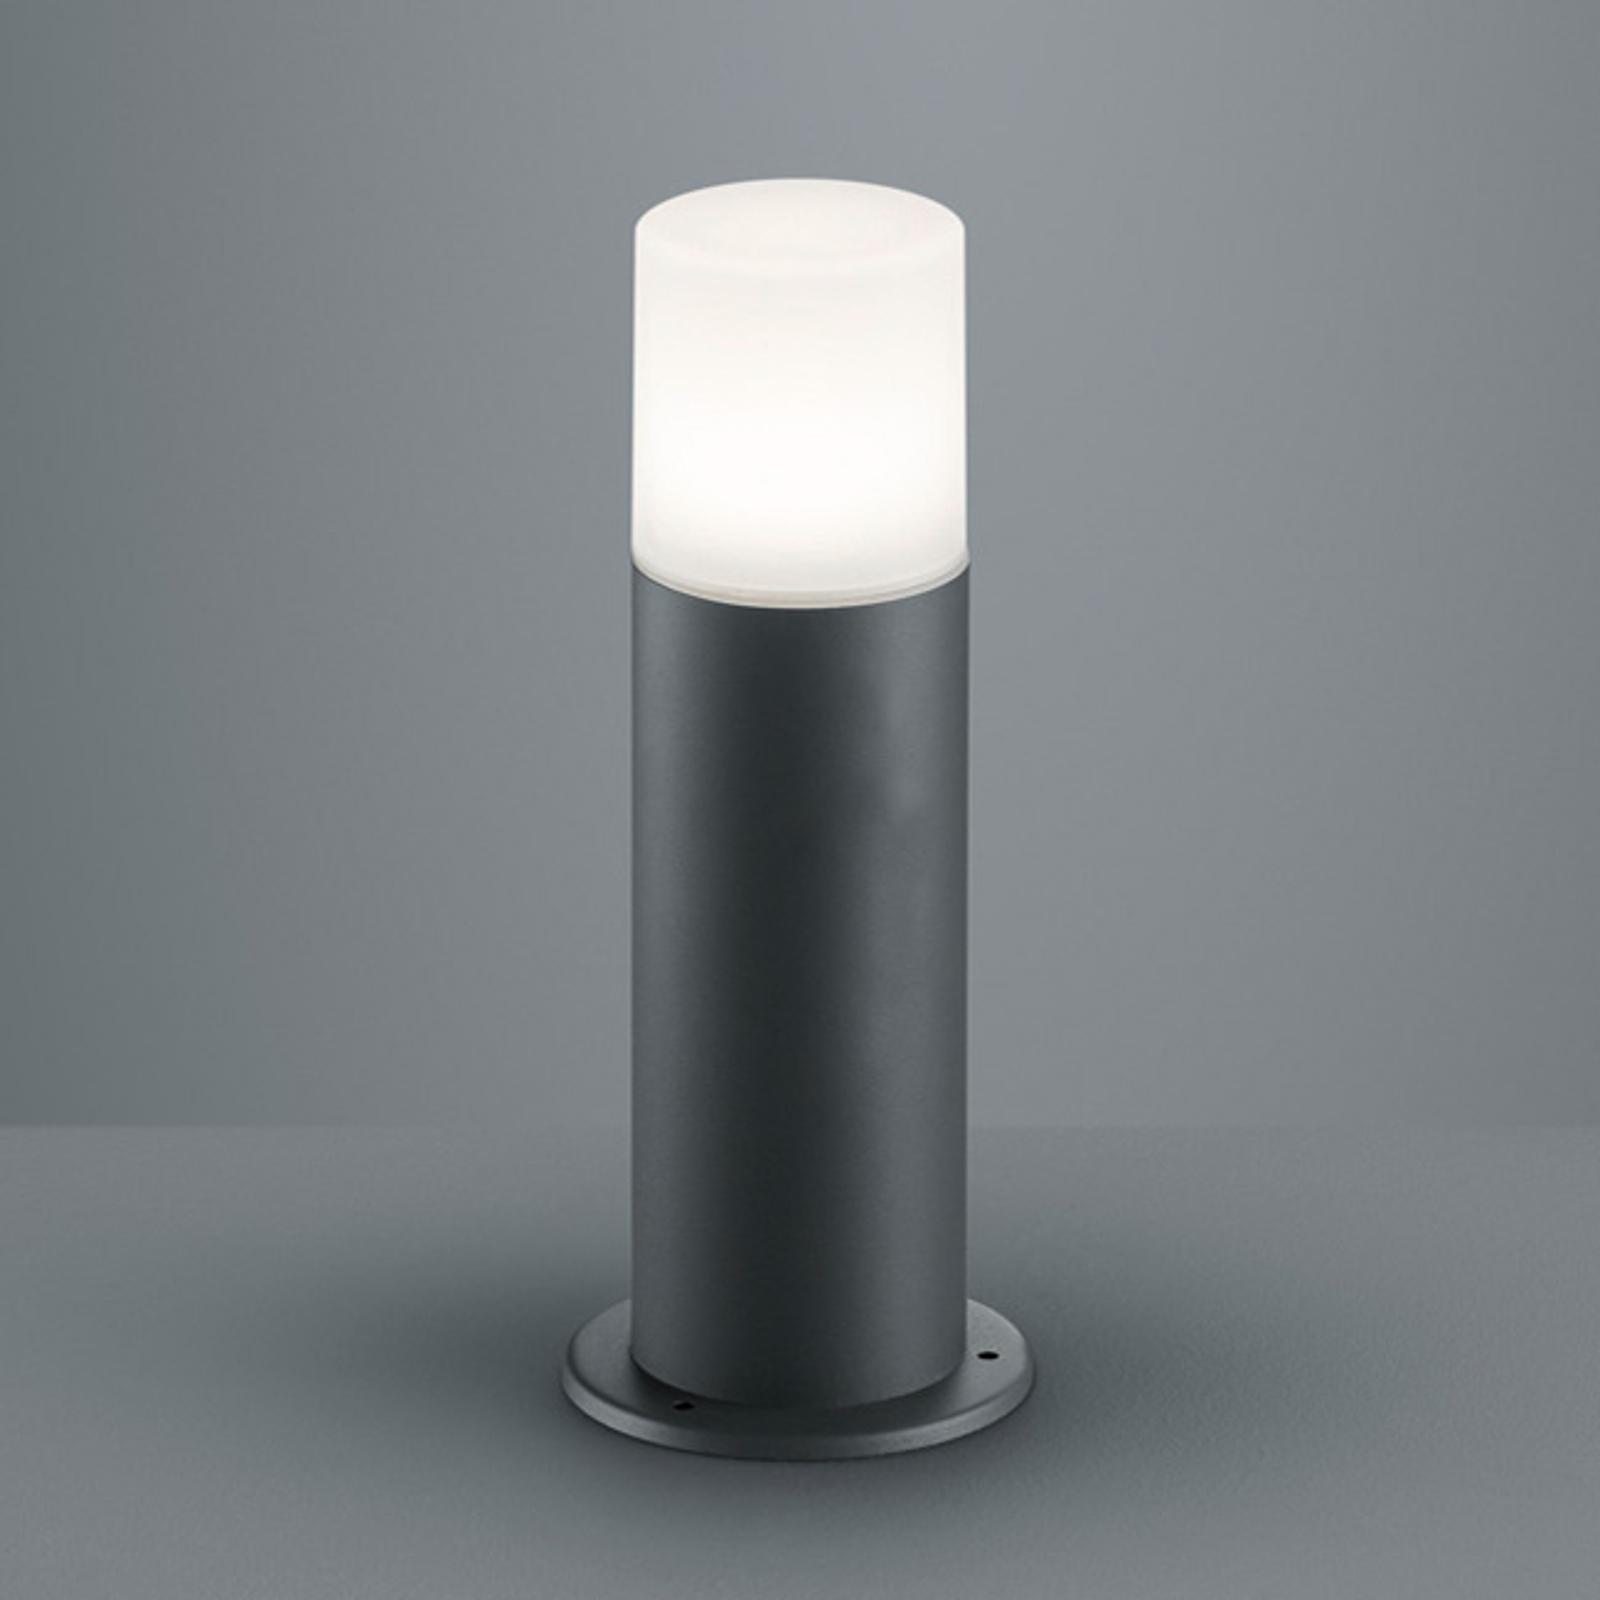 Pollarilamppu Hoosic alumiinipainevalua